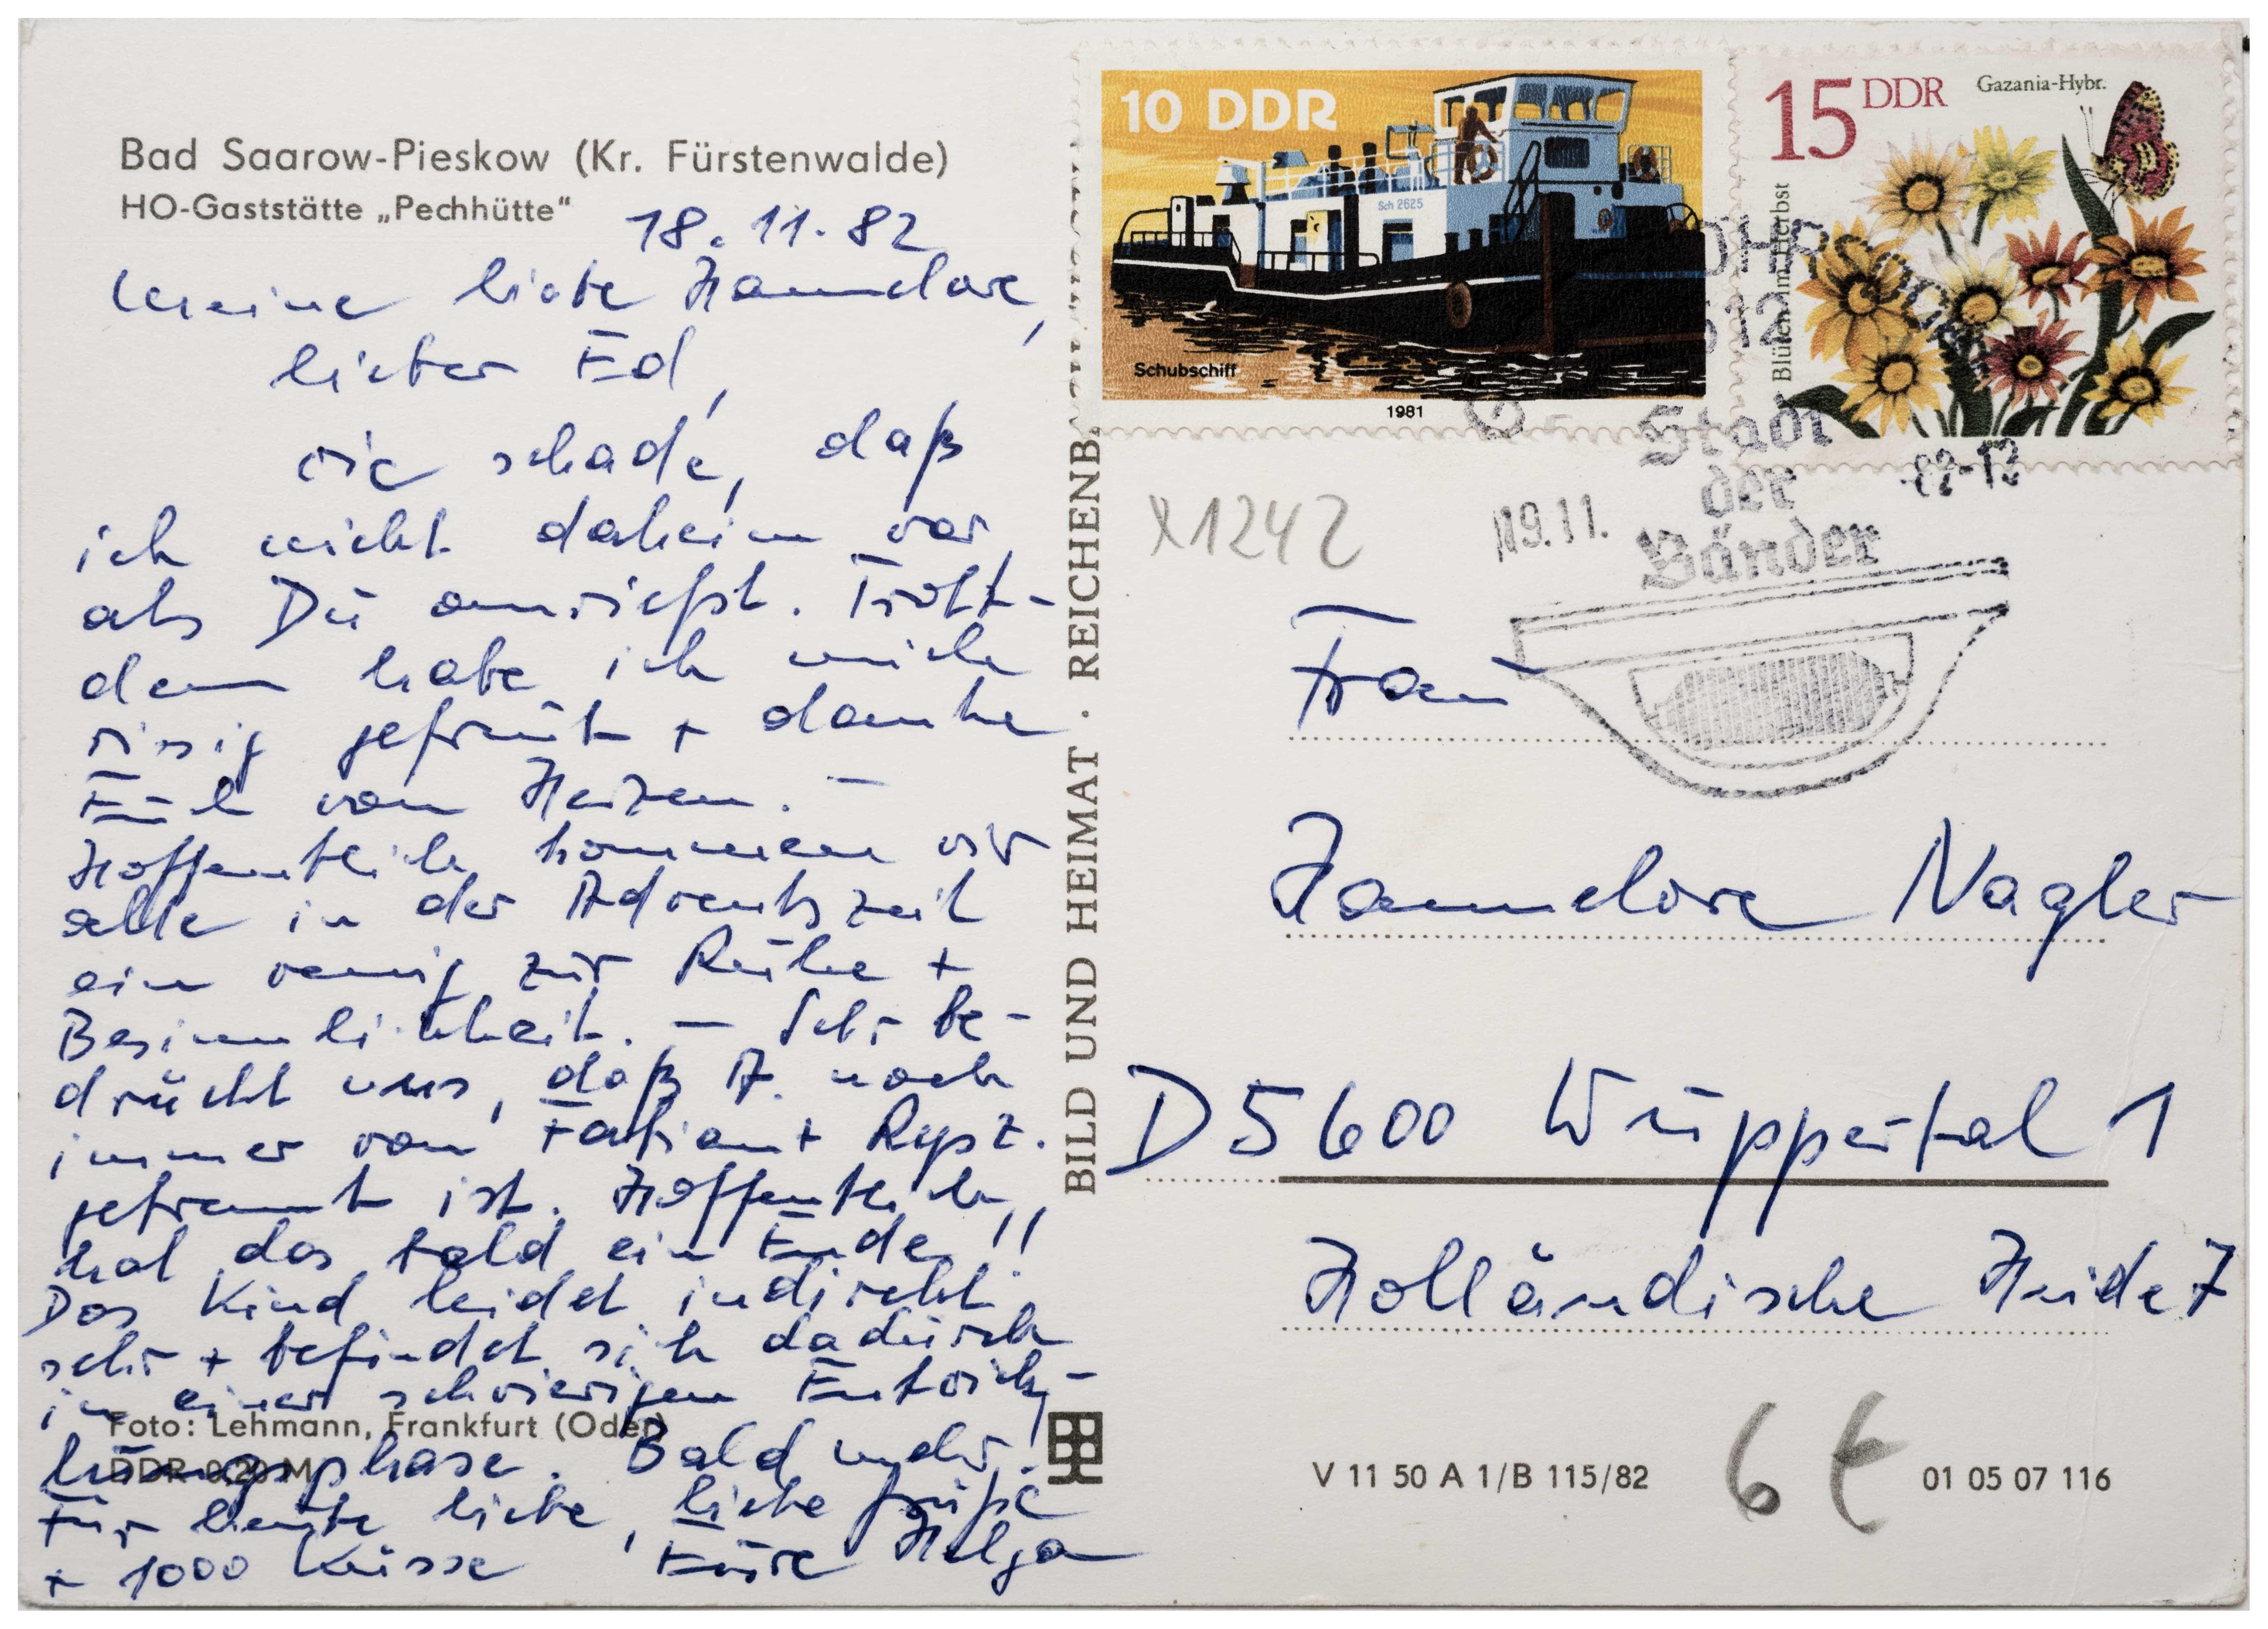 Postkarte Bad Saarow - »HO-Gaststätte Pechhütte« Bad Saarow-Pieskow